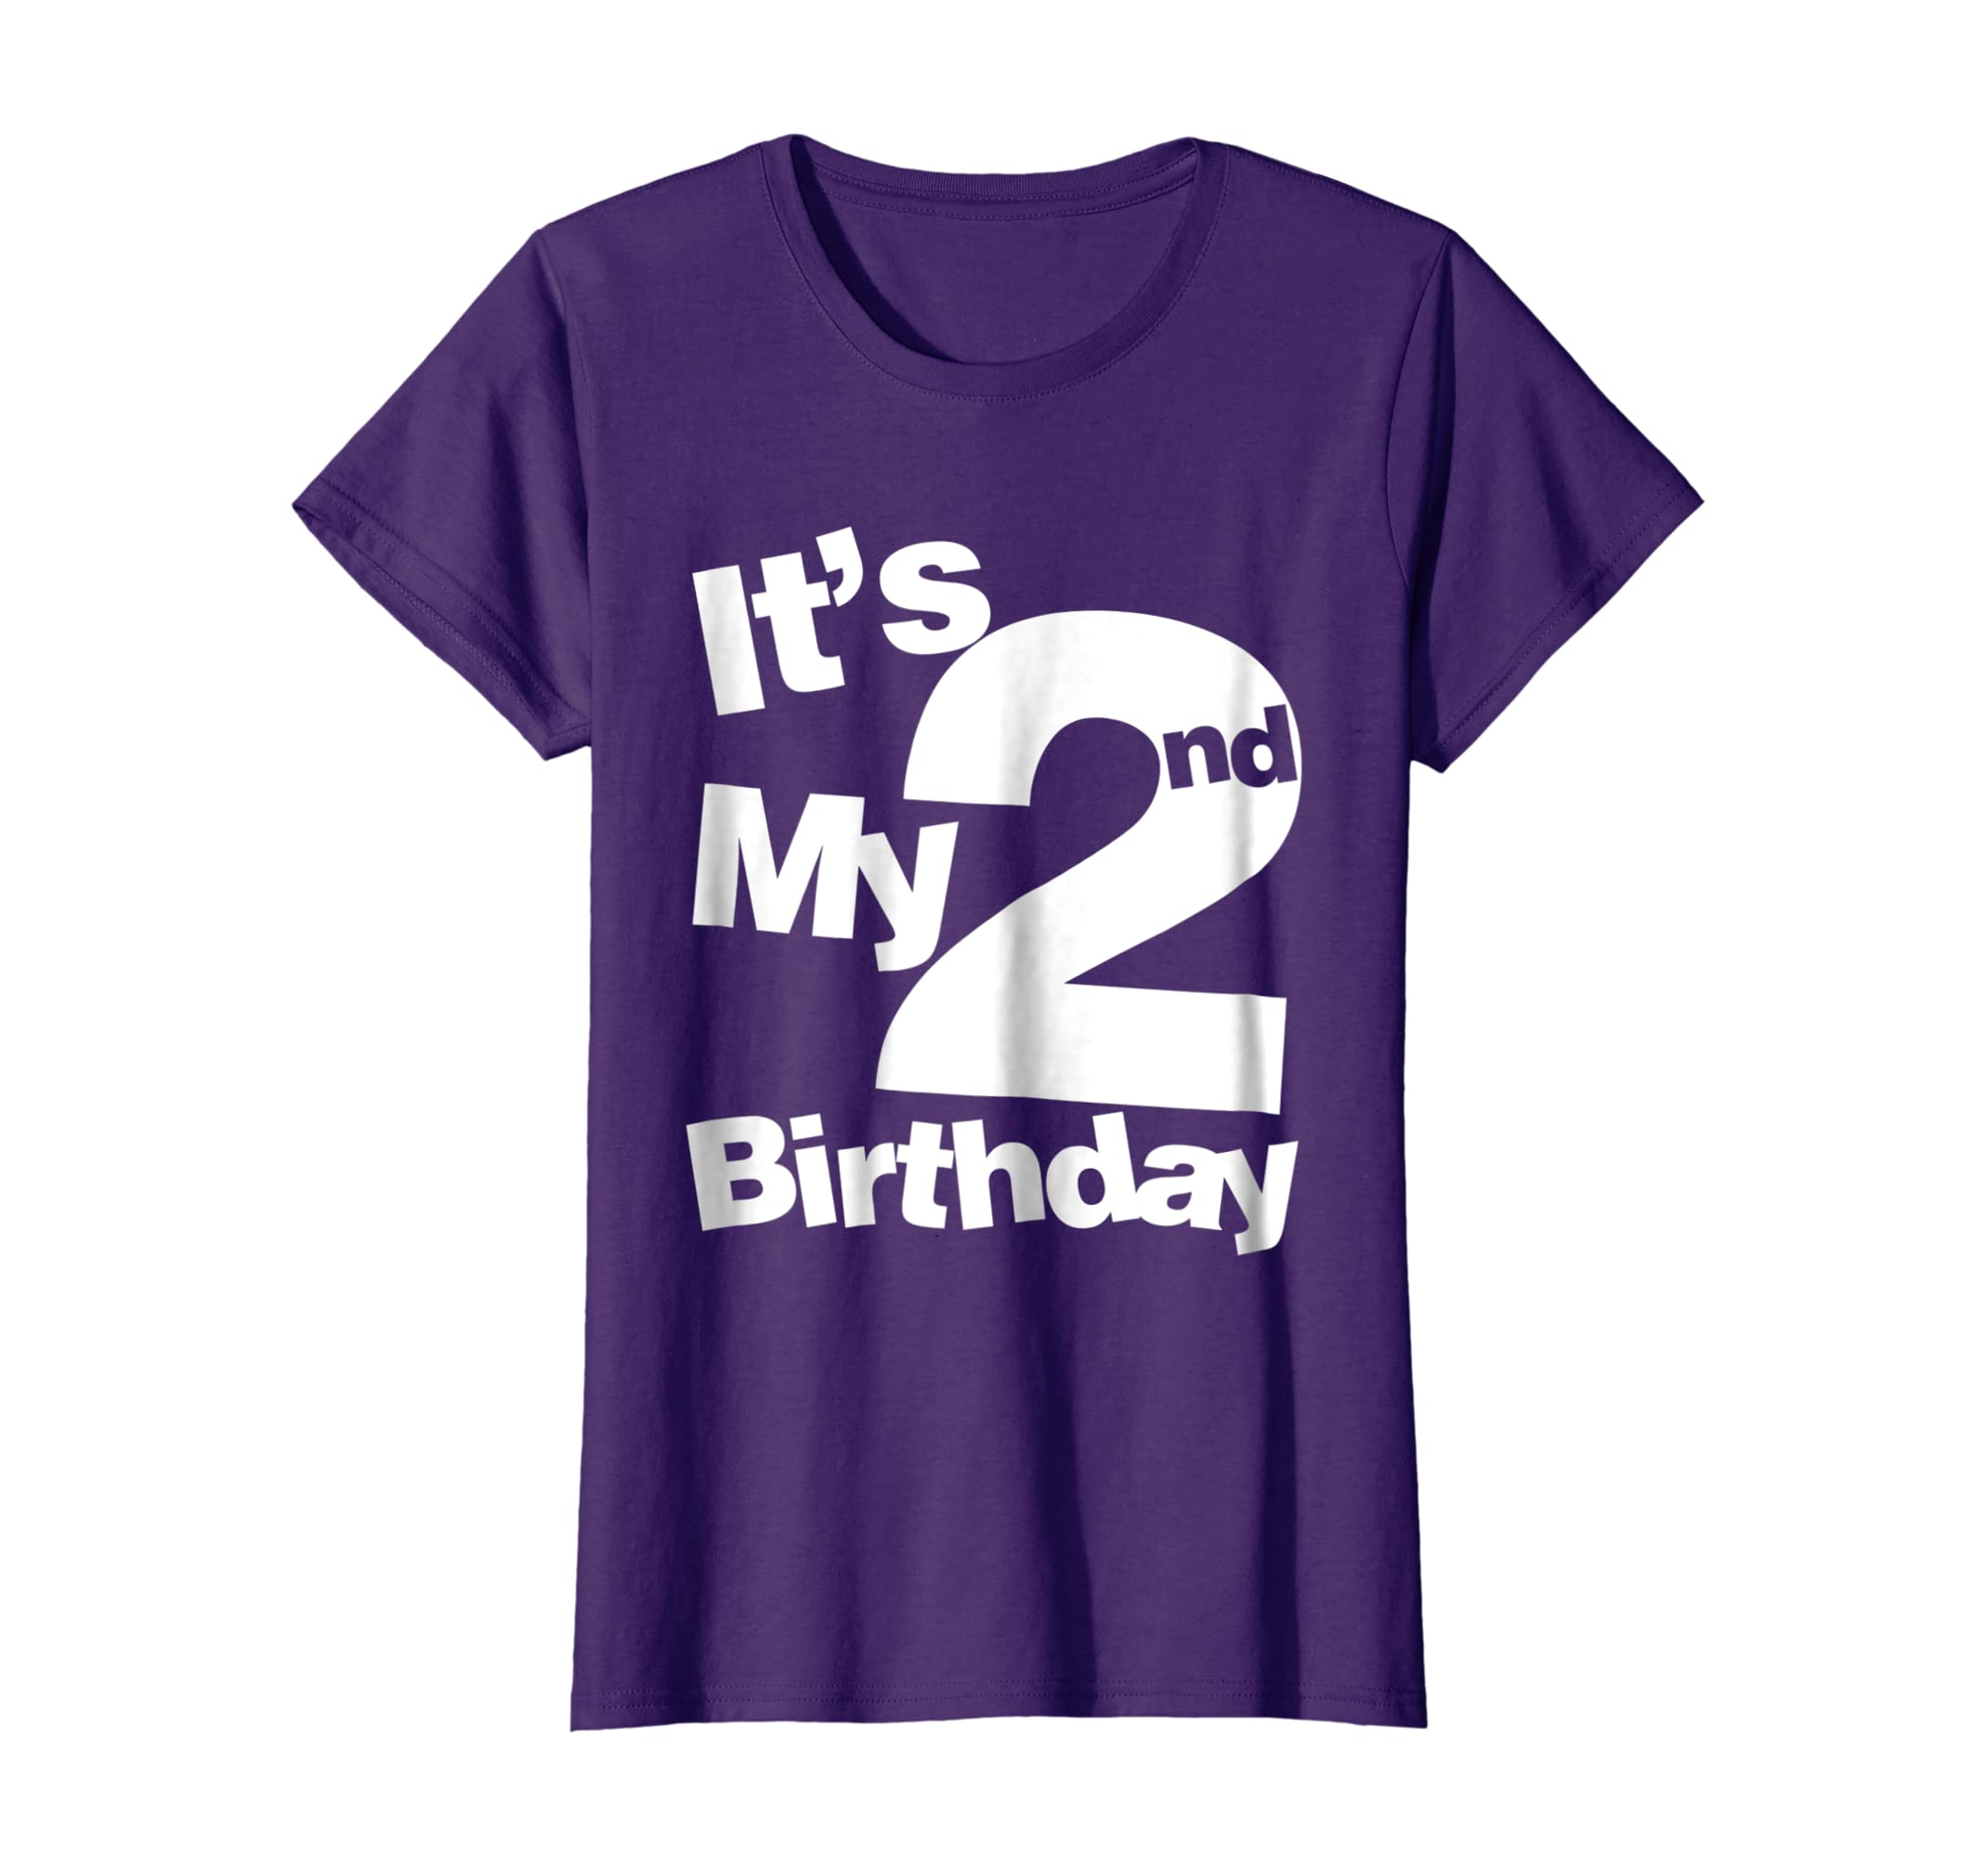 Amazon 2nd Birthday Shirt Its My T 2 Clothing